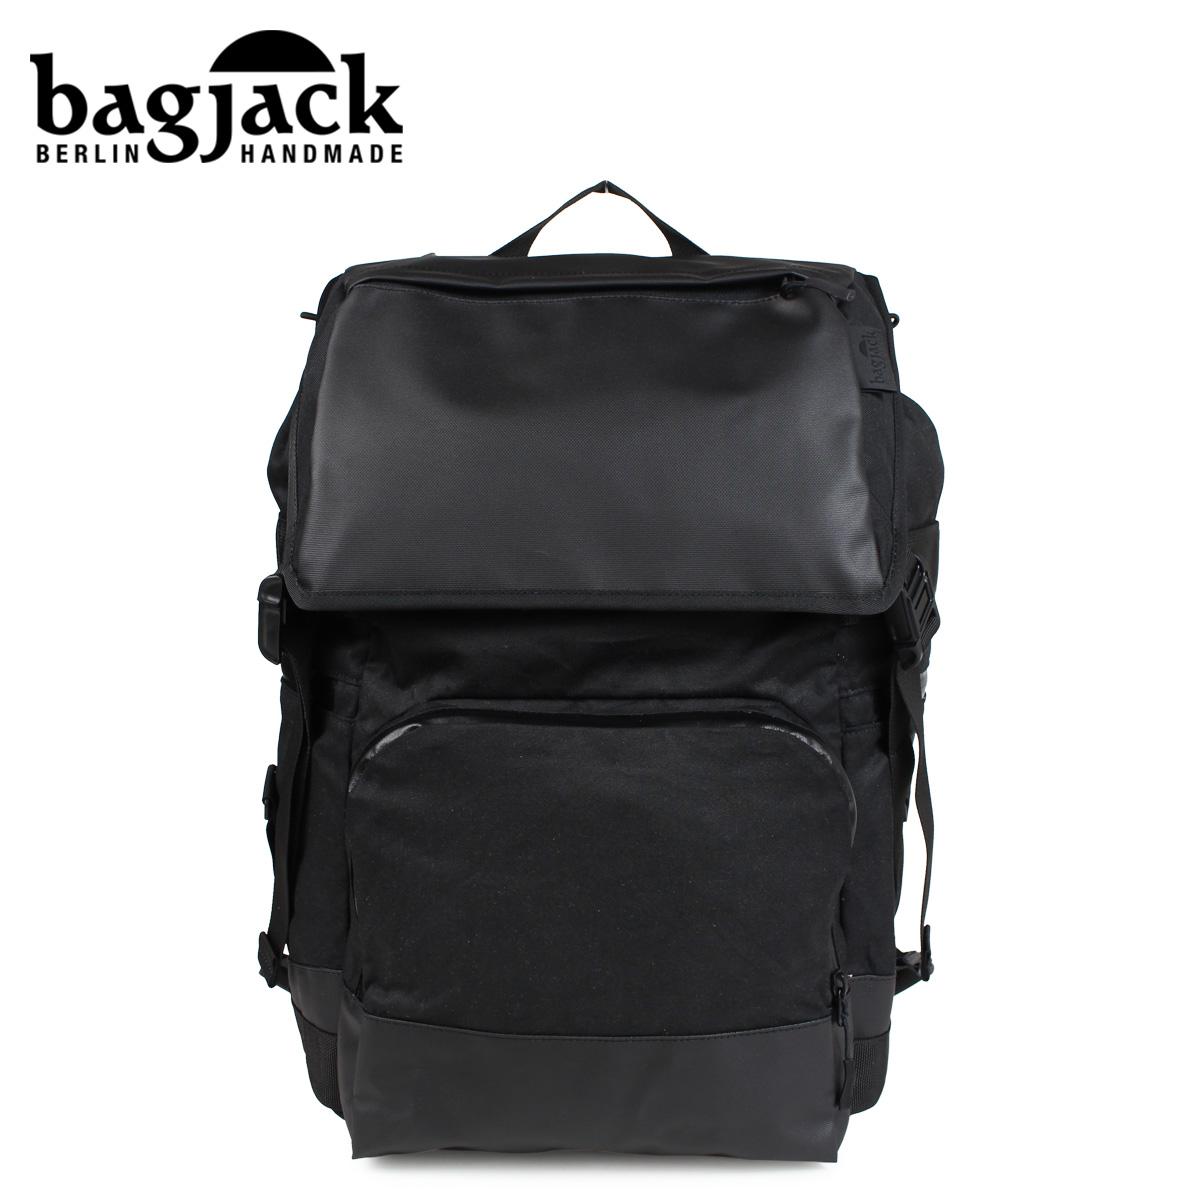 bagjack NEXT LEVEL NATURE TEC RUCKSACK バッグジャック リュック バックパック メンズ レディース ブラック